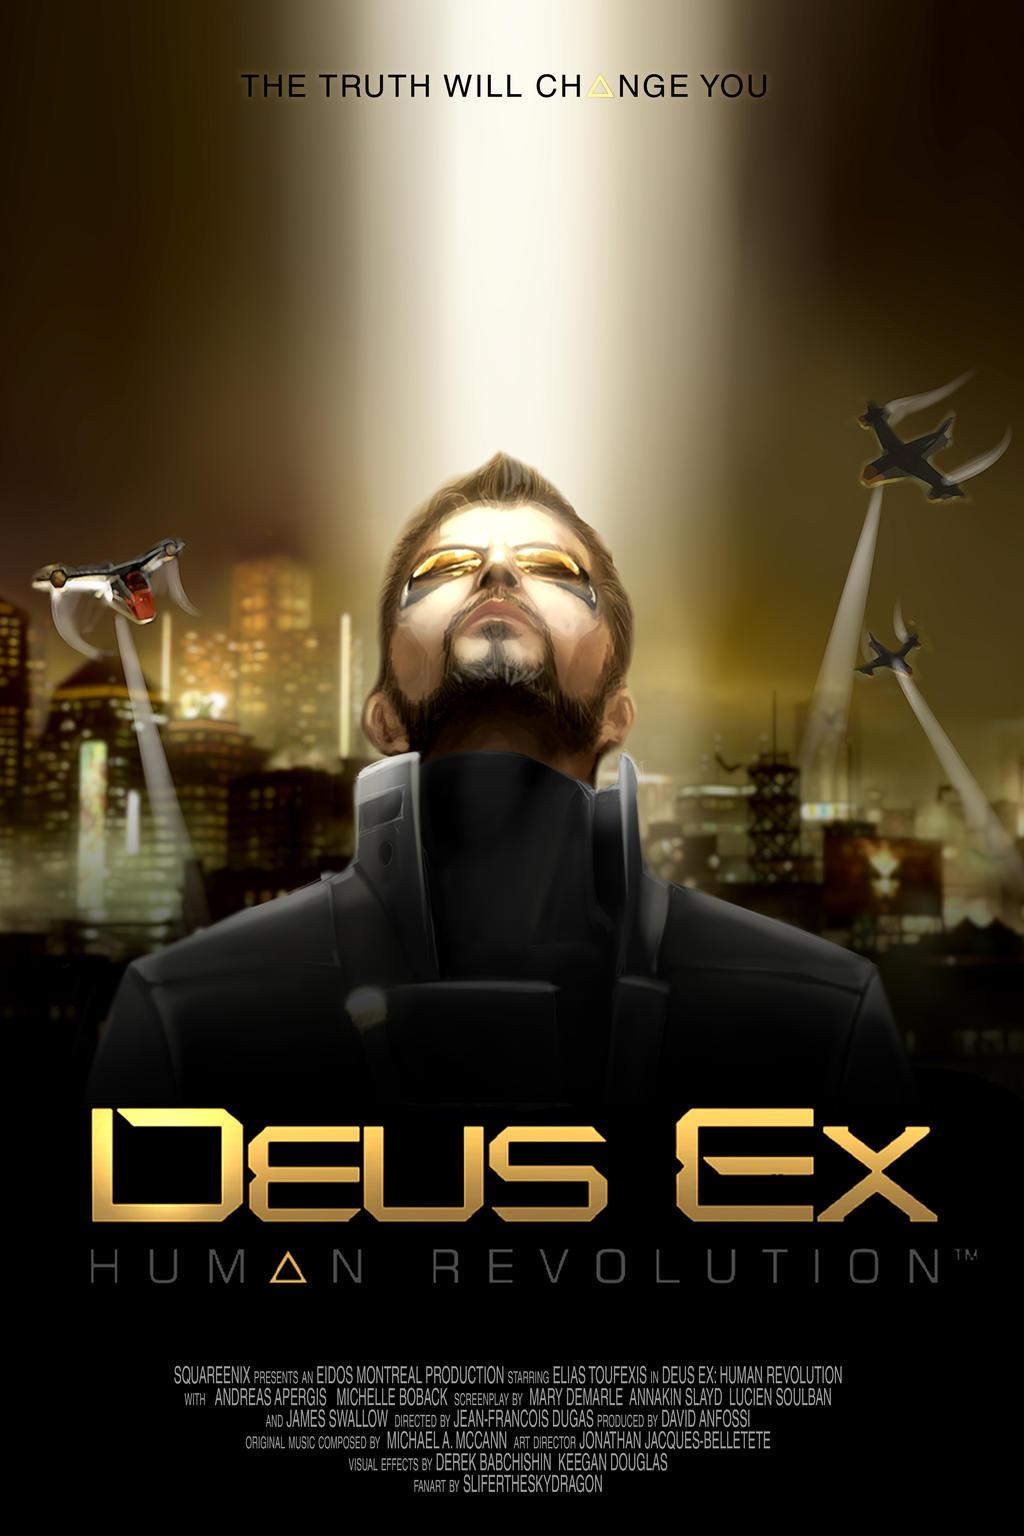 Deus Ex Human Revolution omage by slifertheskydragon